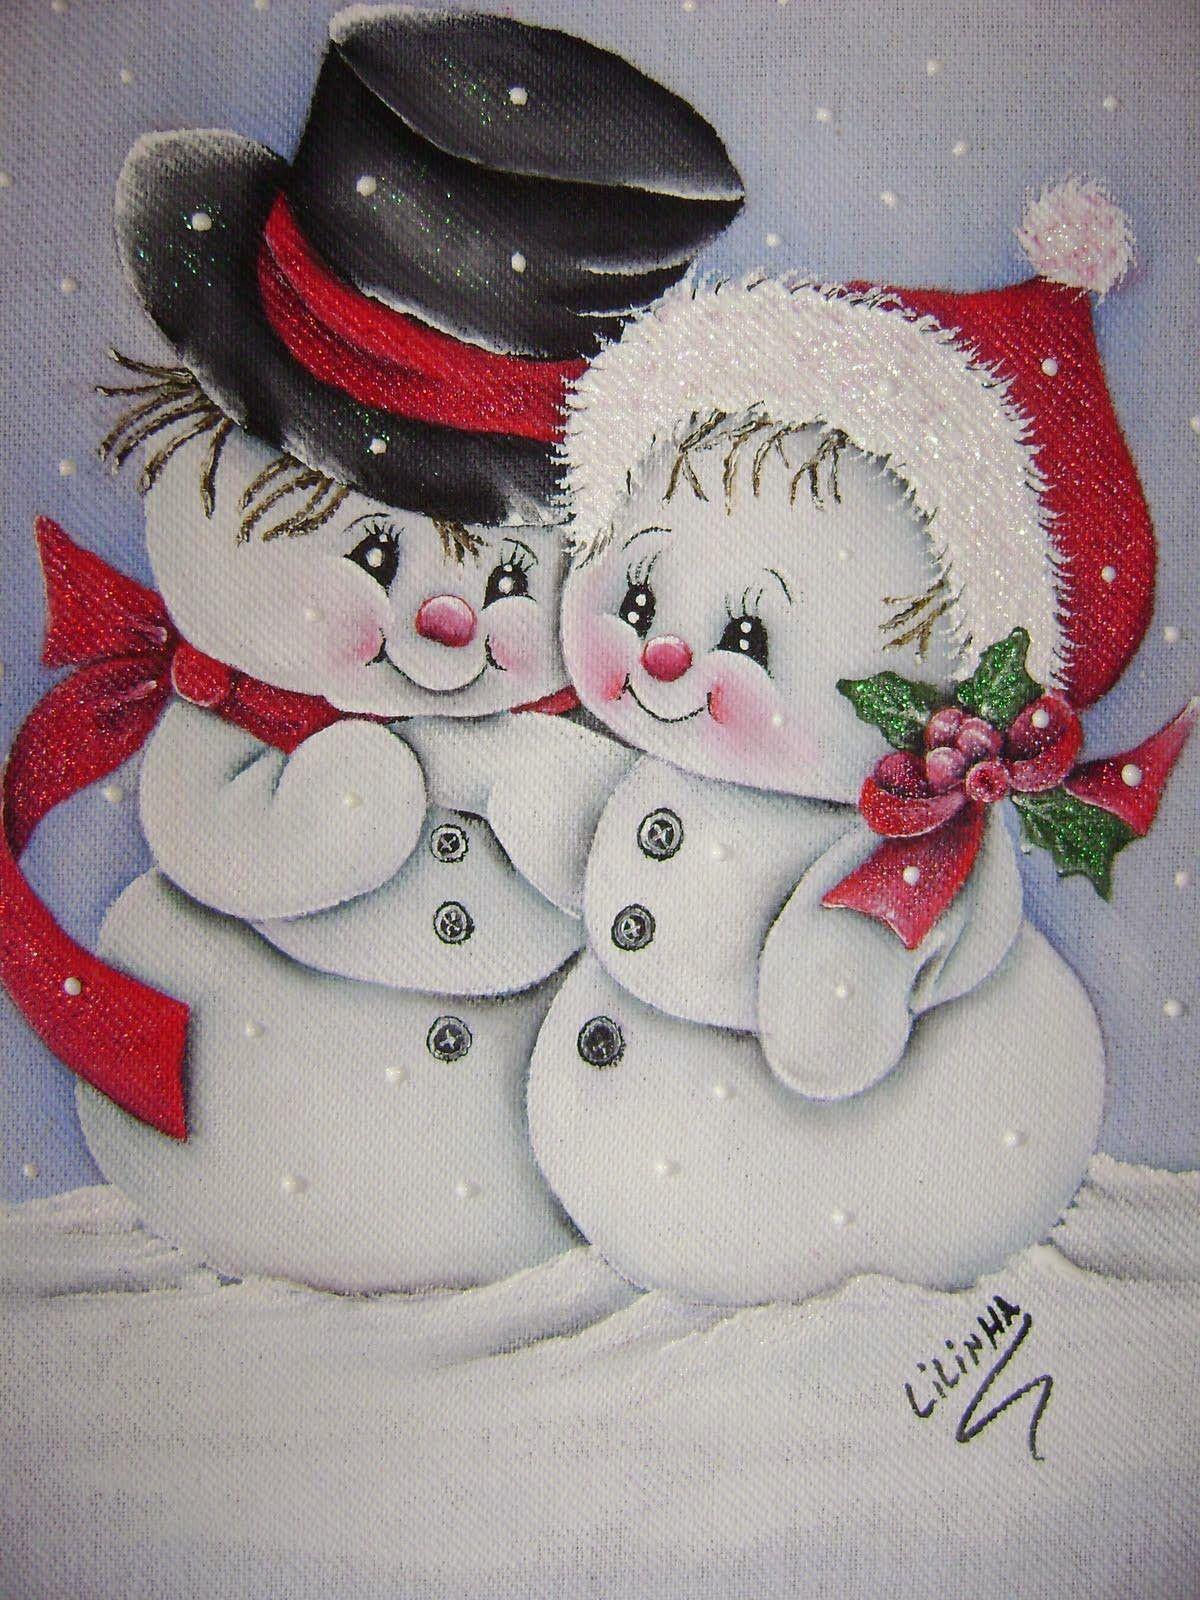 033.jpg (1200×1600) | christmas | Pinterest | Pinturas, Navidad y ...